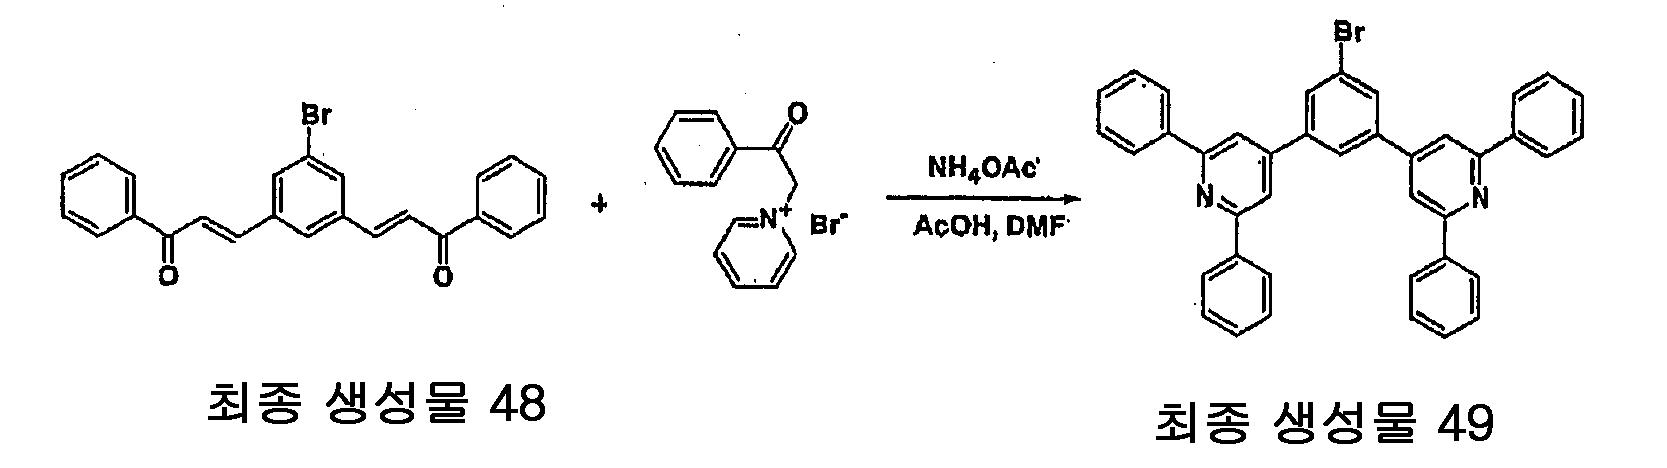 Figure 112010002231902-pat00137